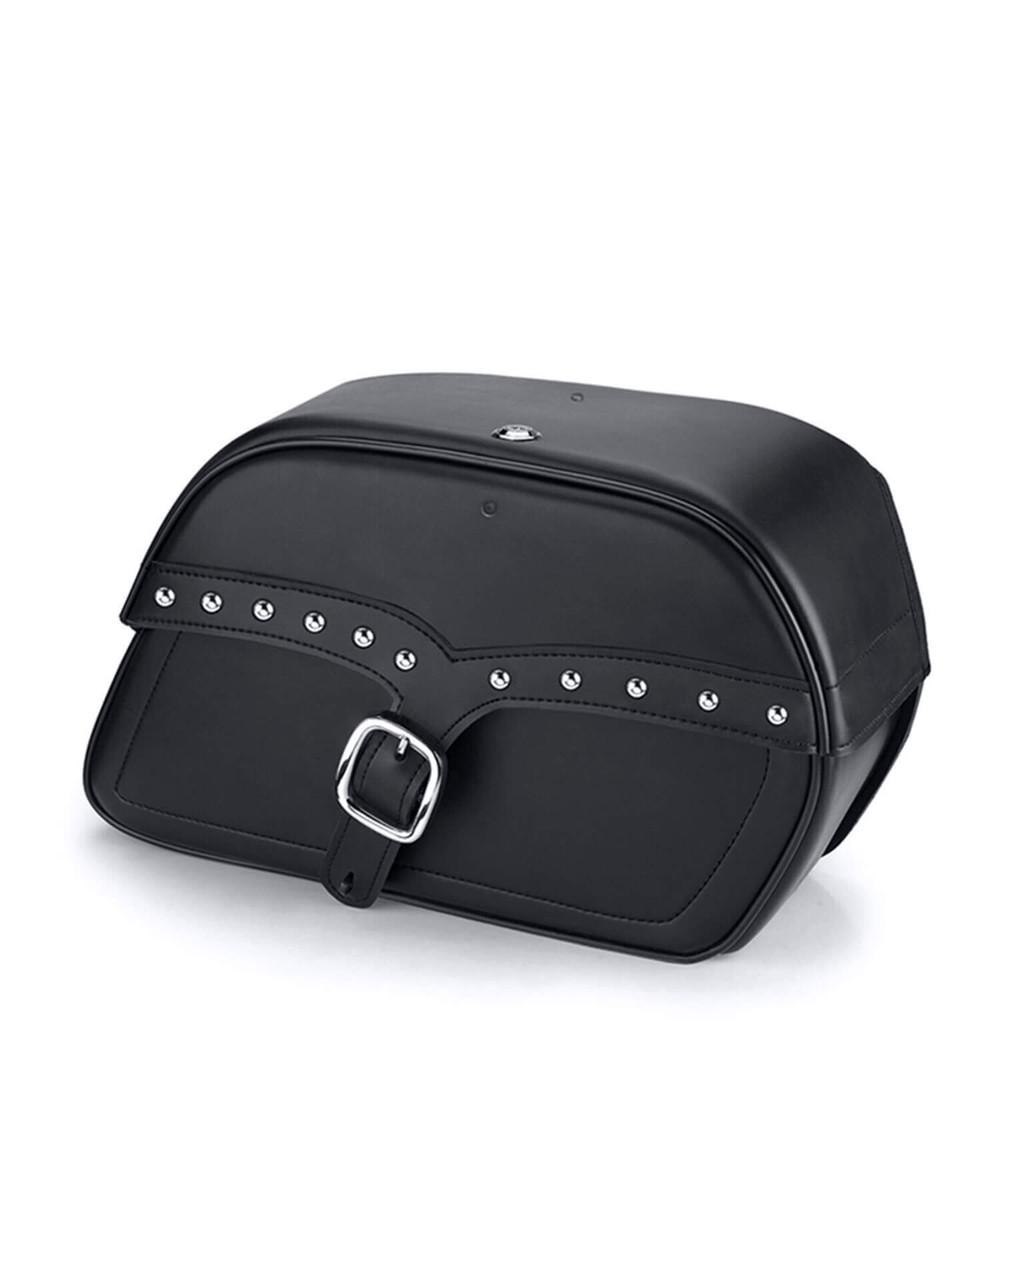 Yamaha Startoliner XV 1900 Medium Charger Single Strap Studded Motorcycle Saddlebags Bag View